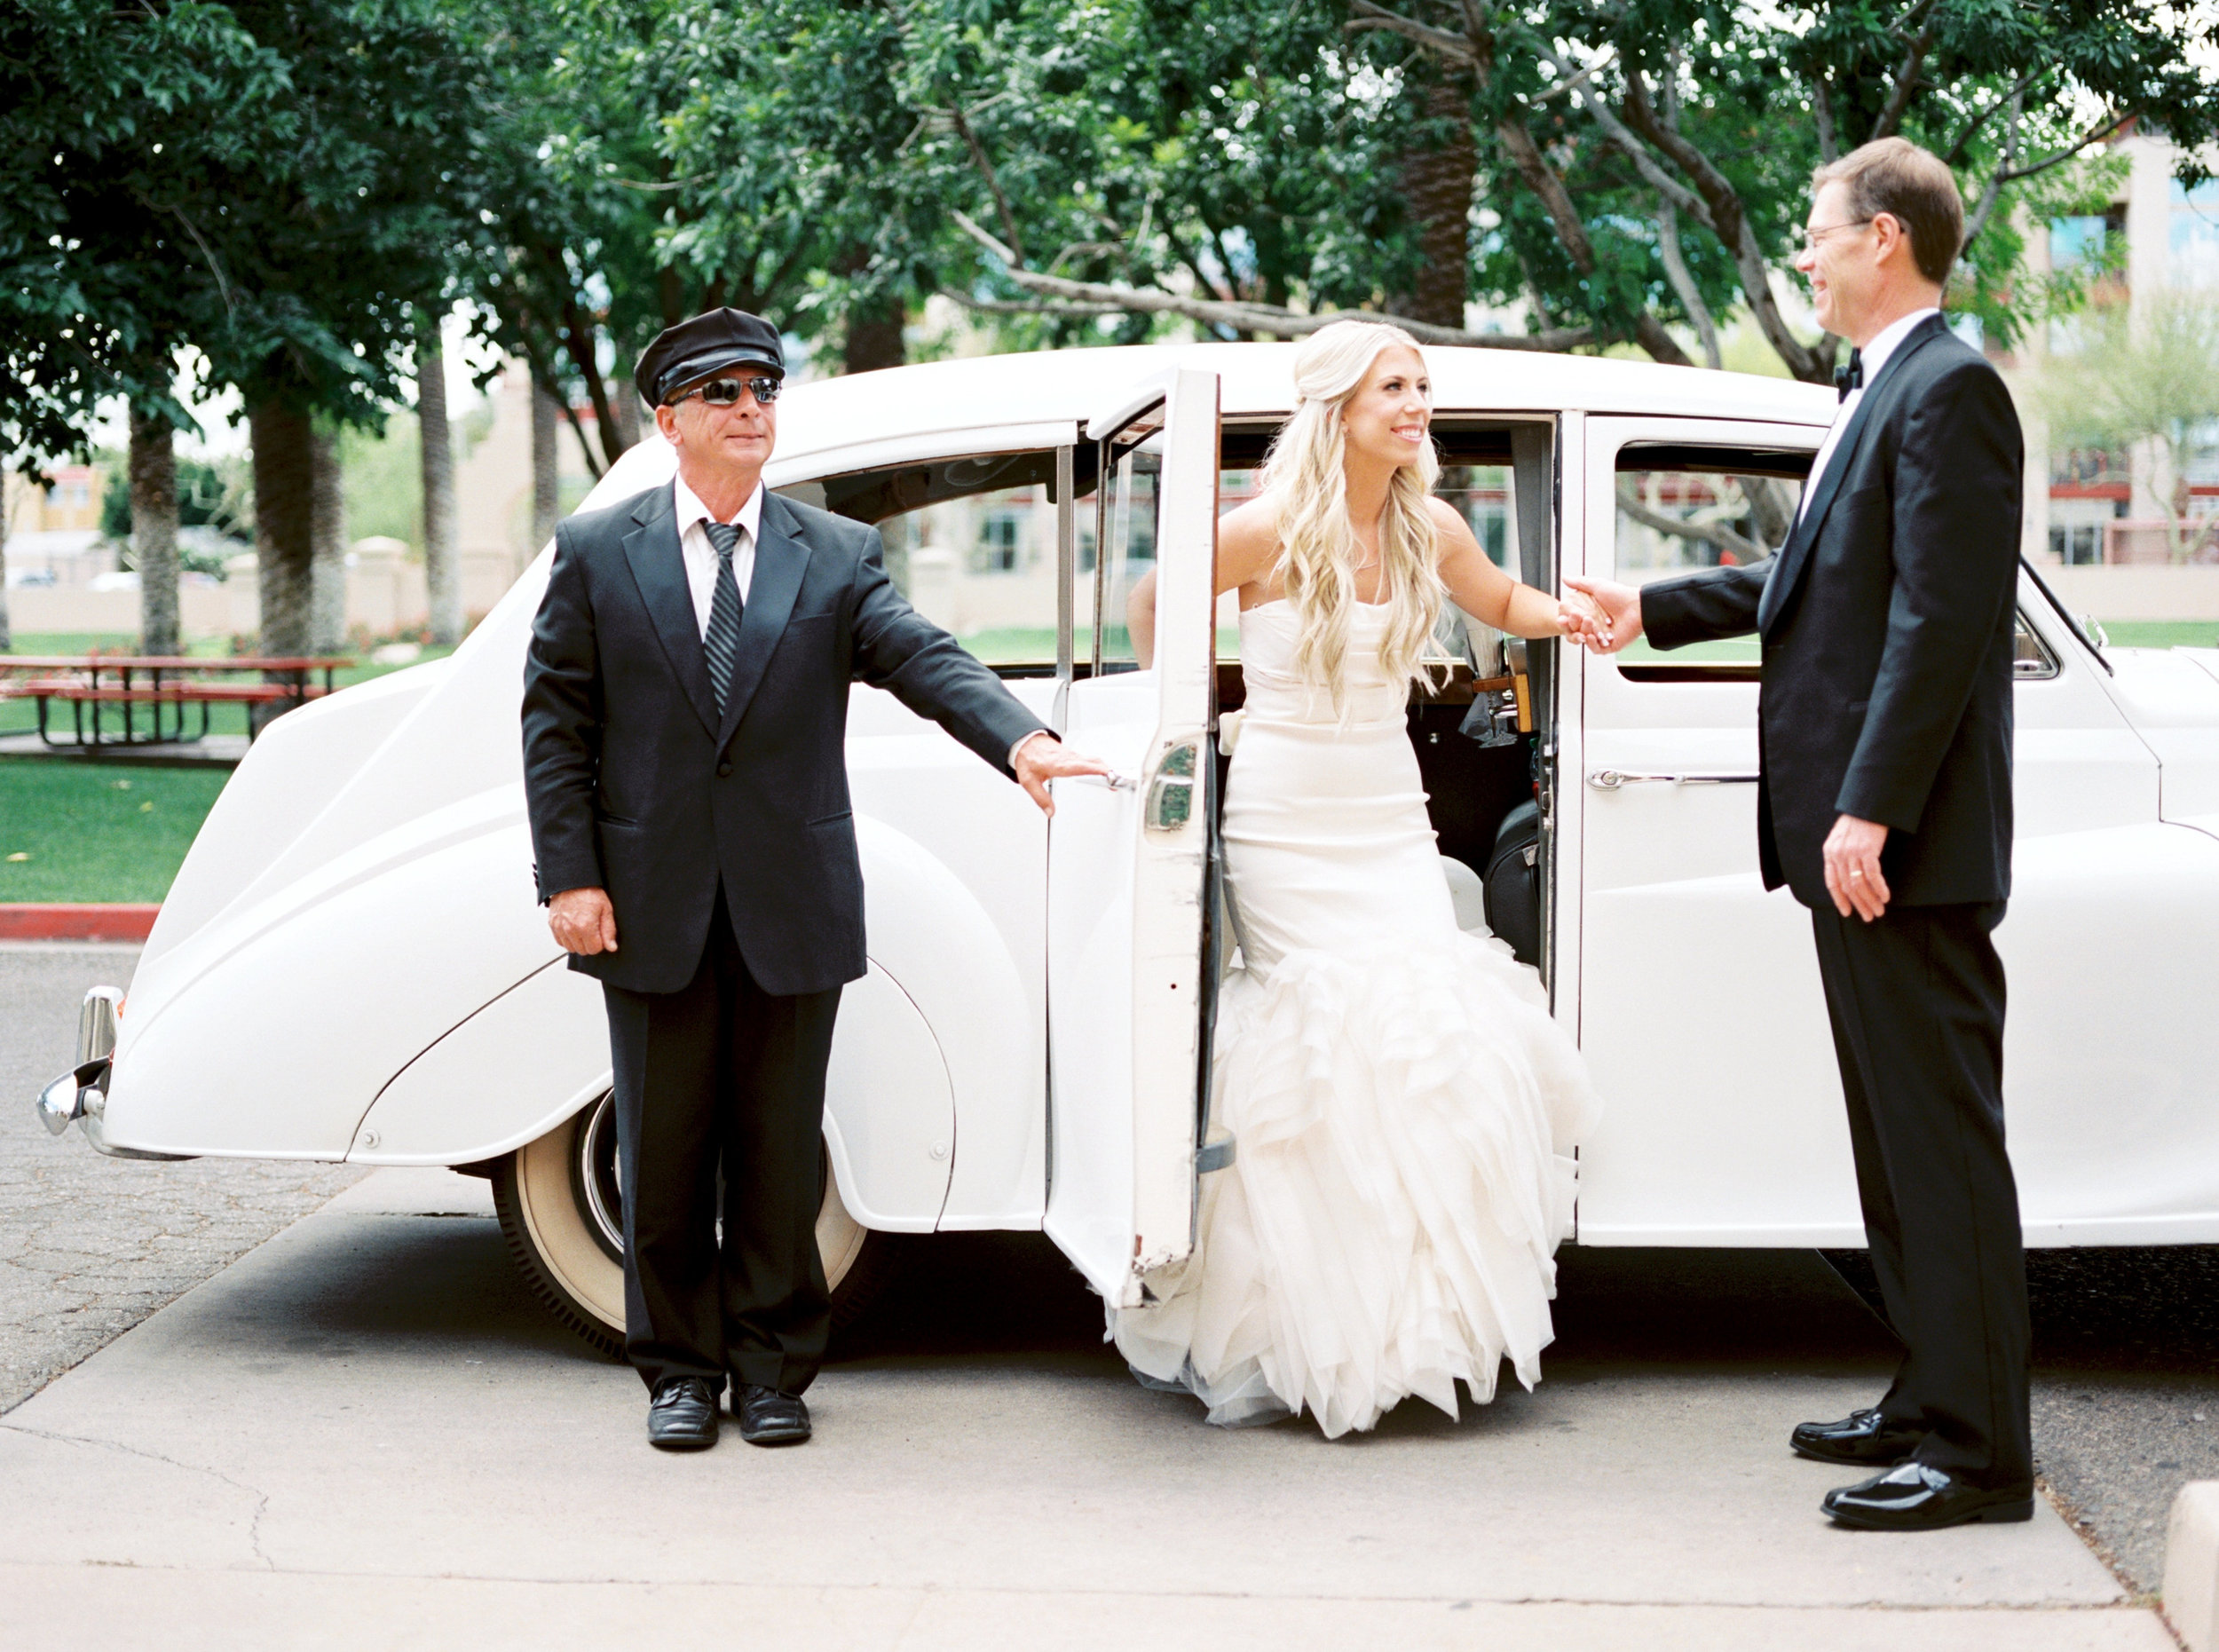 wedding transportation, Rolls Royce wedding transportation, bride transportation, father of the bride transportation